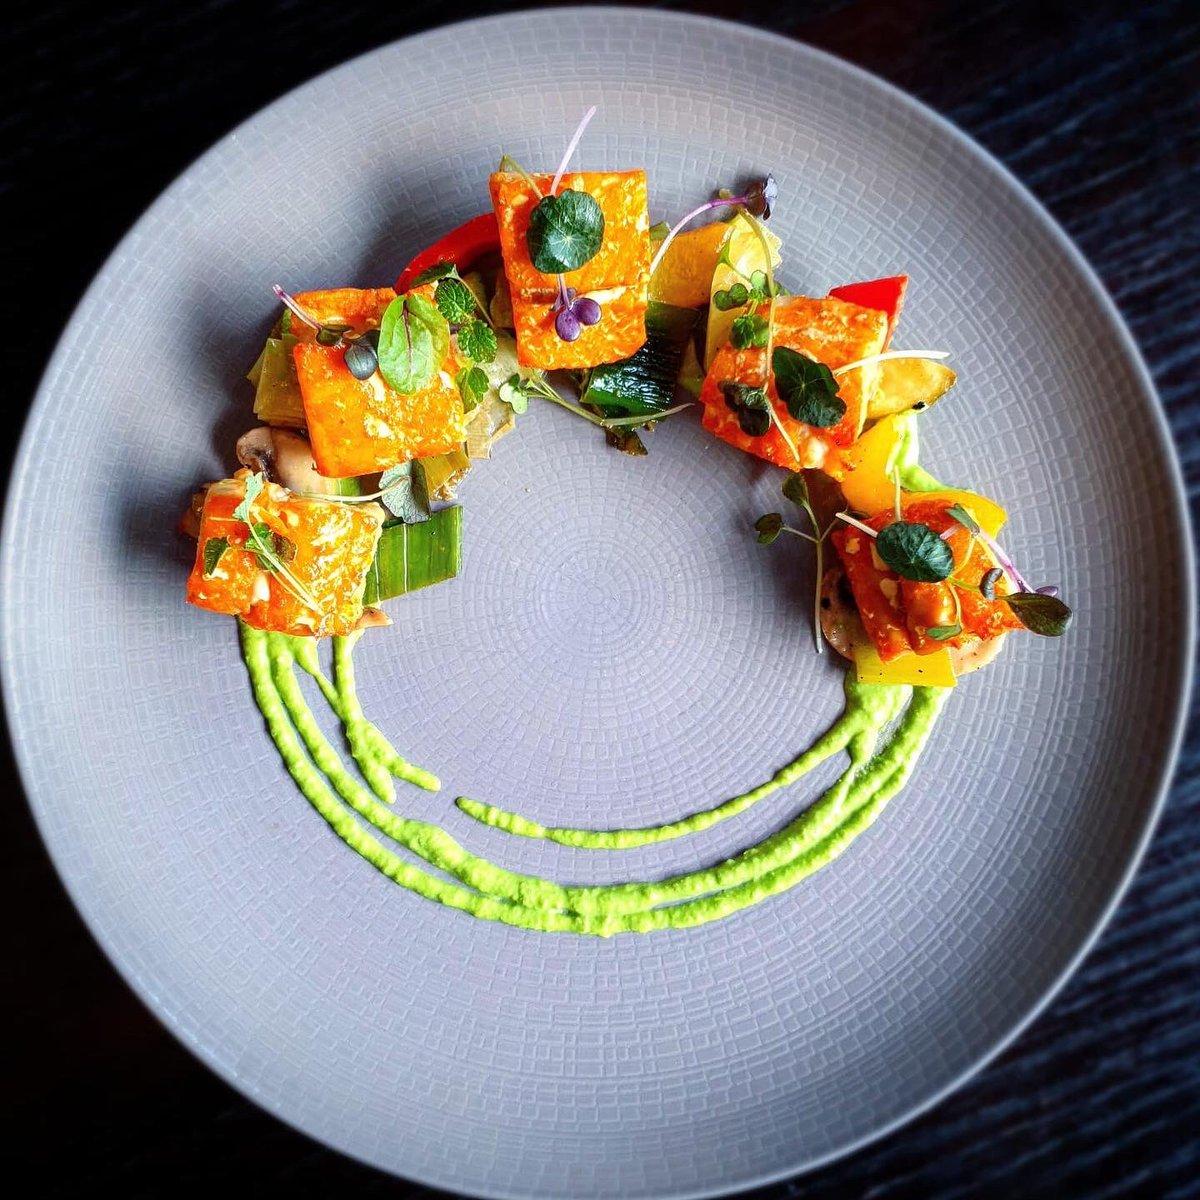 Smoked cod bites with roast vegetables & pea puree   #dublincitycentre #dublinonourdoorstep #Ourteam #chefgoals #chefteam #dublinfood #dublindining https://t.co/9a2kIEN8dL